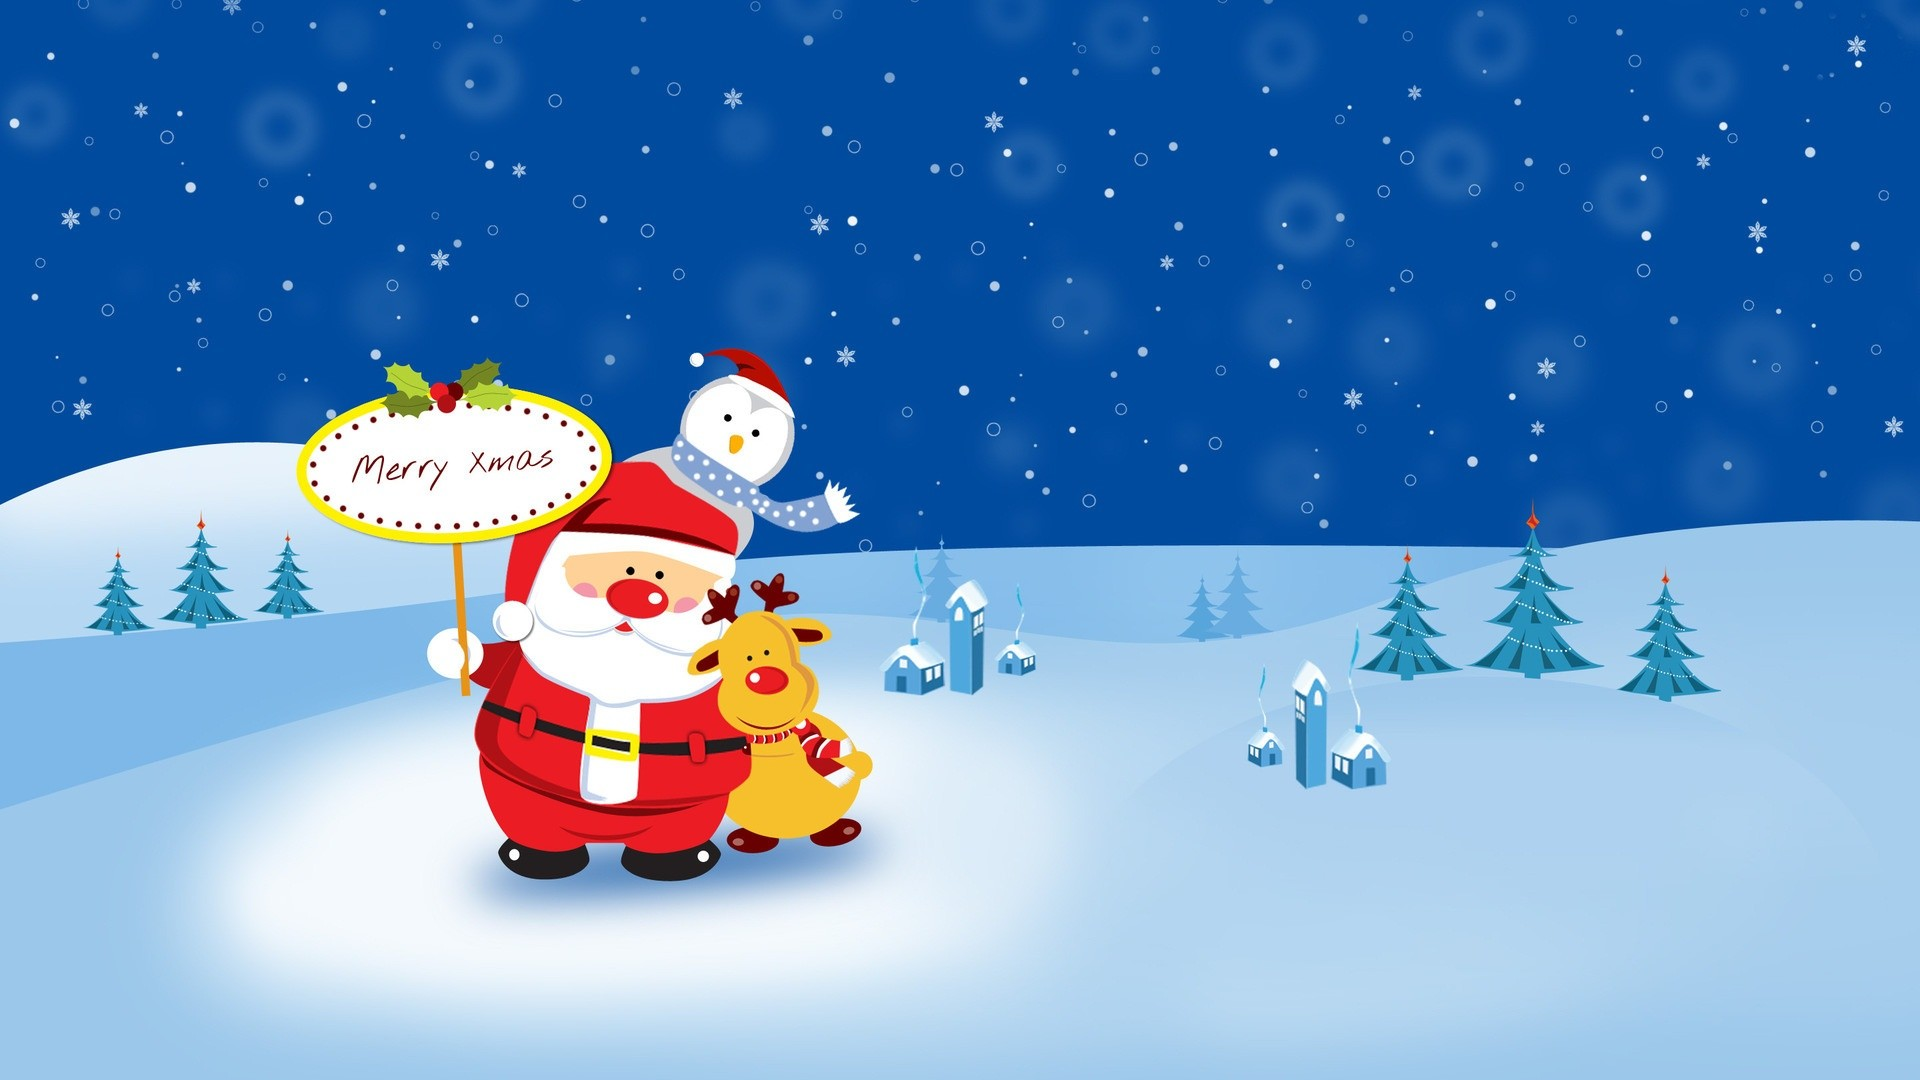 Hdwallpaperhd Wallpaper Happy Christmas Cartoon Pic Phone